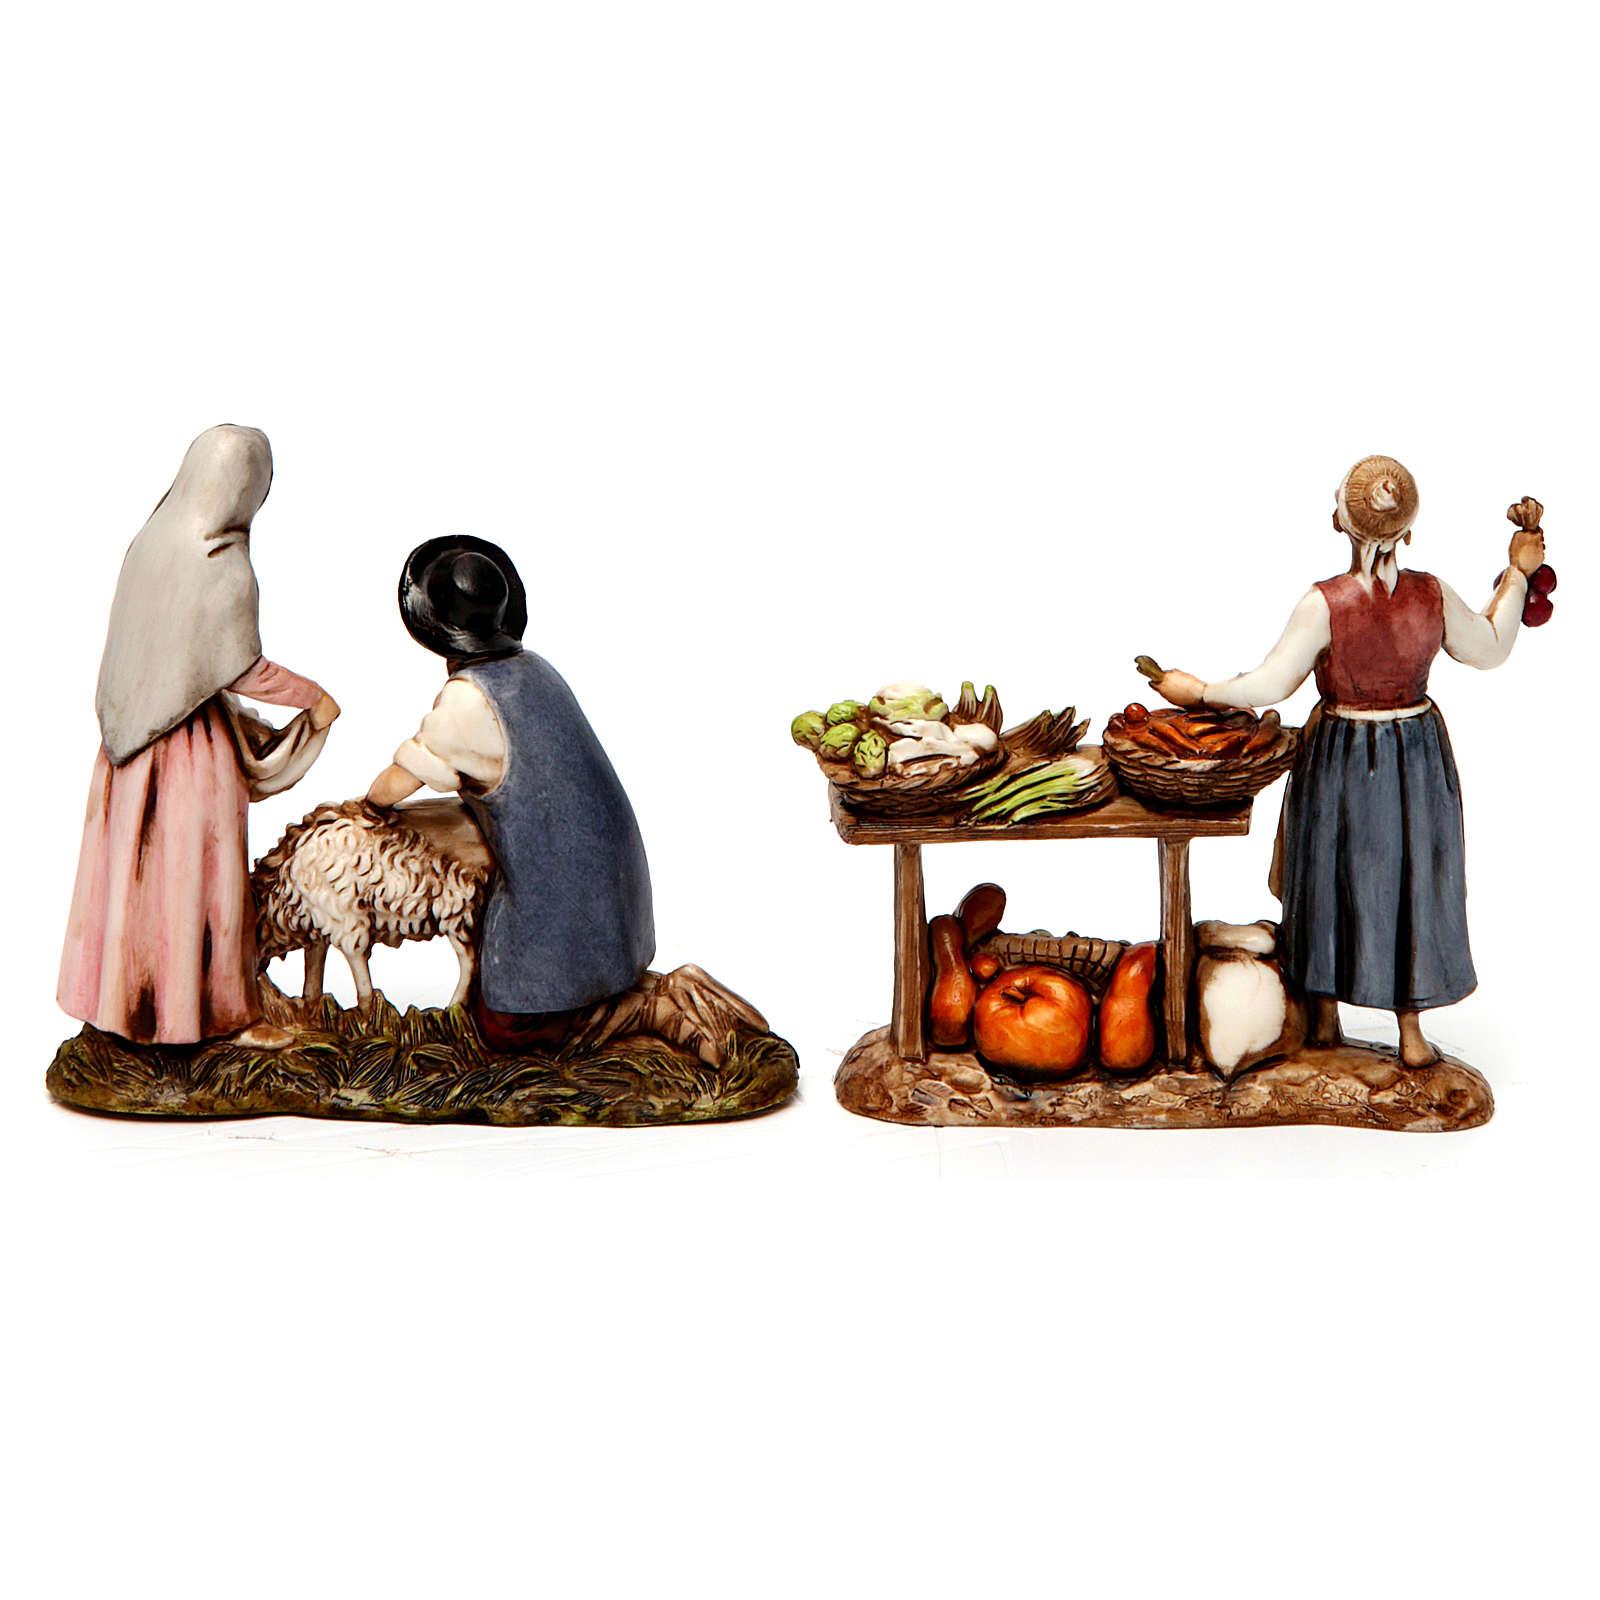 Grupo de vendedora de verduras y esquiladores 8 cm Moranduzzo 2 figuras 4